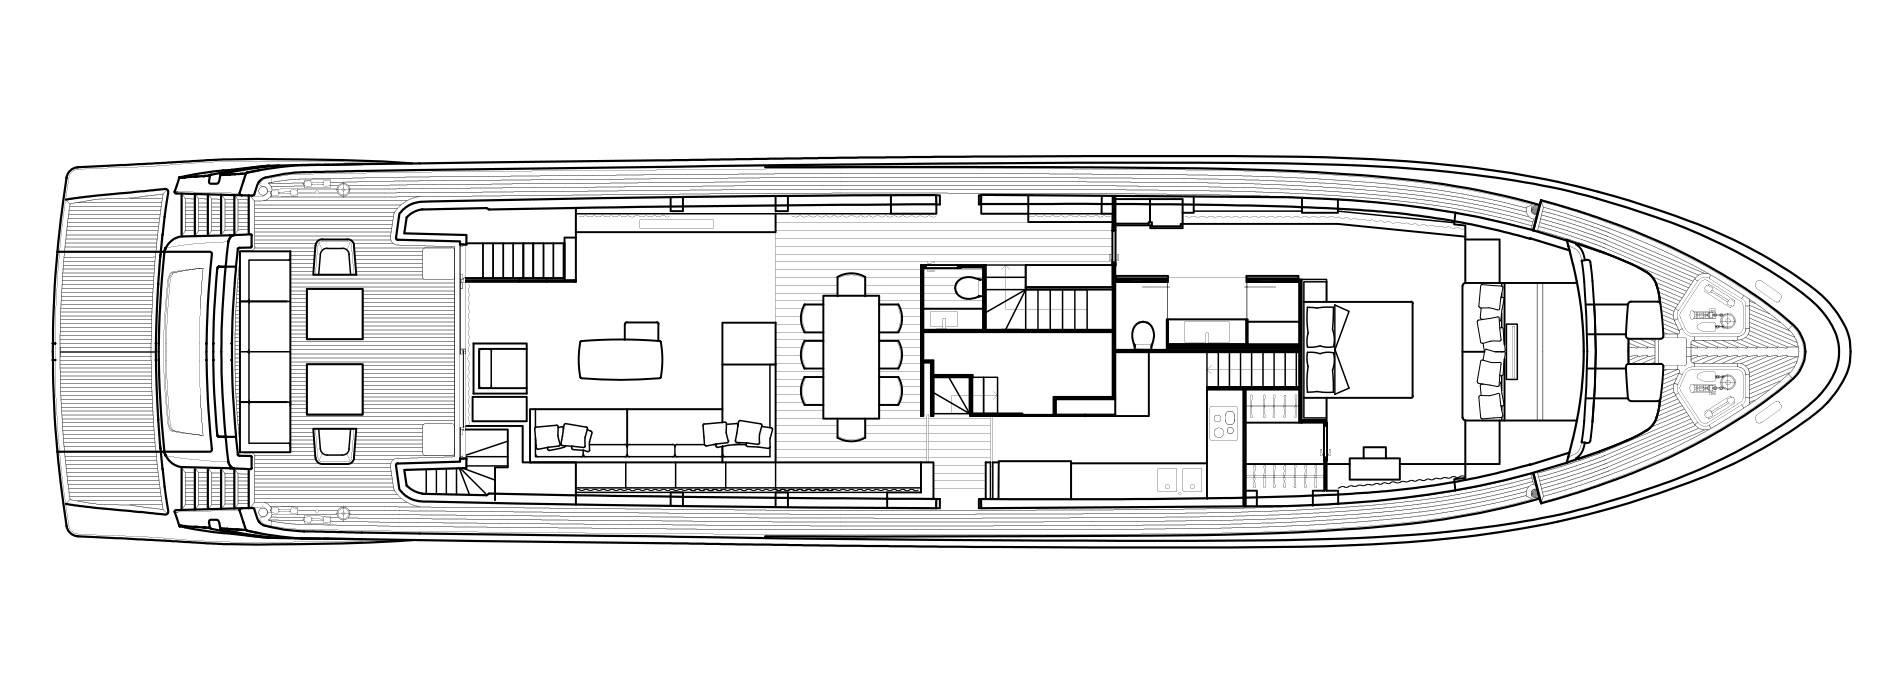 Sanlorenzo Yachts SL106 Main Deck